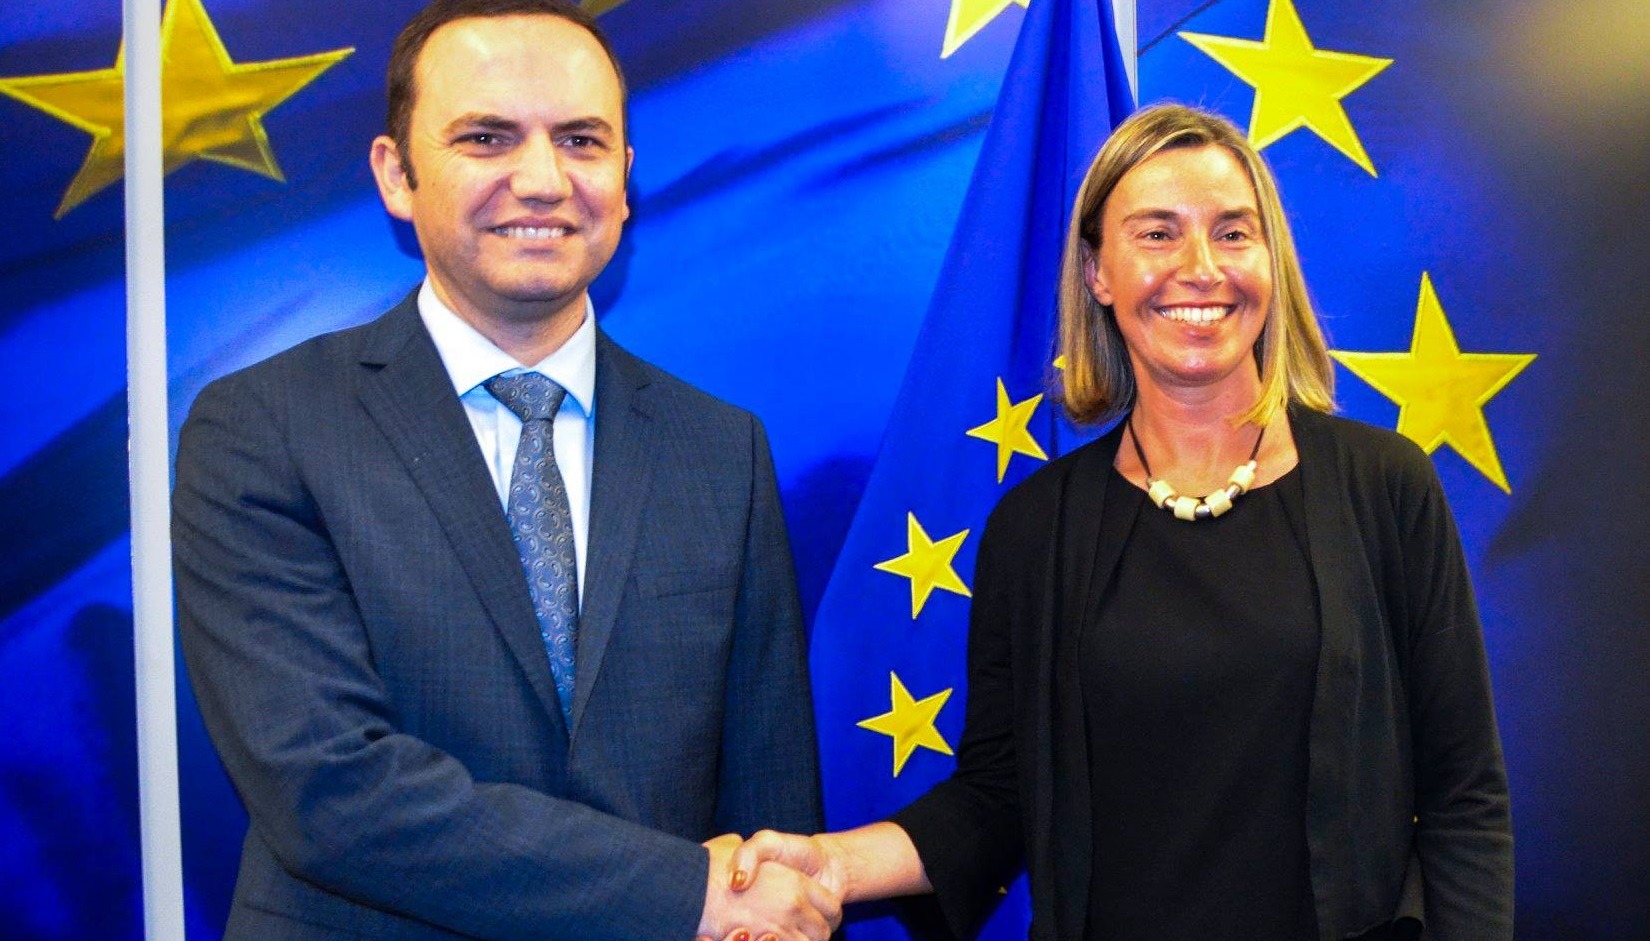 Osmani: Οι επόμενες ώρες μπορεί να είναι κρίσιμες για την έκβαση των διαπραγματεύσεων